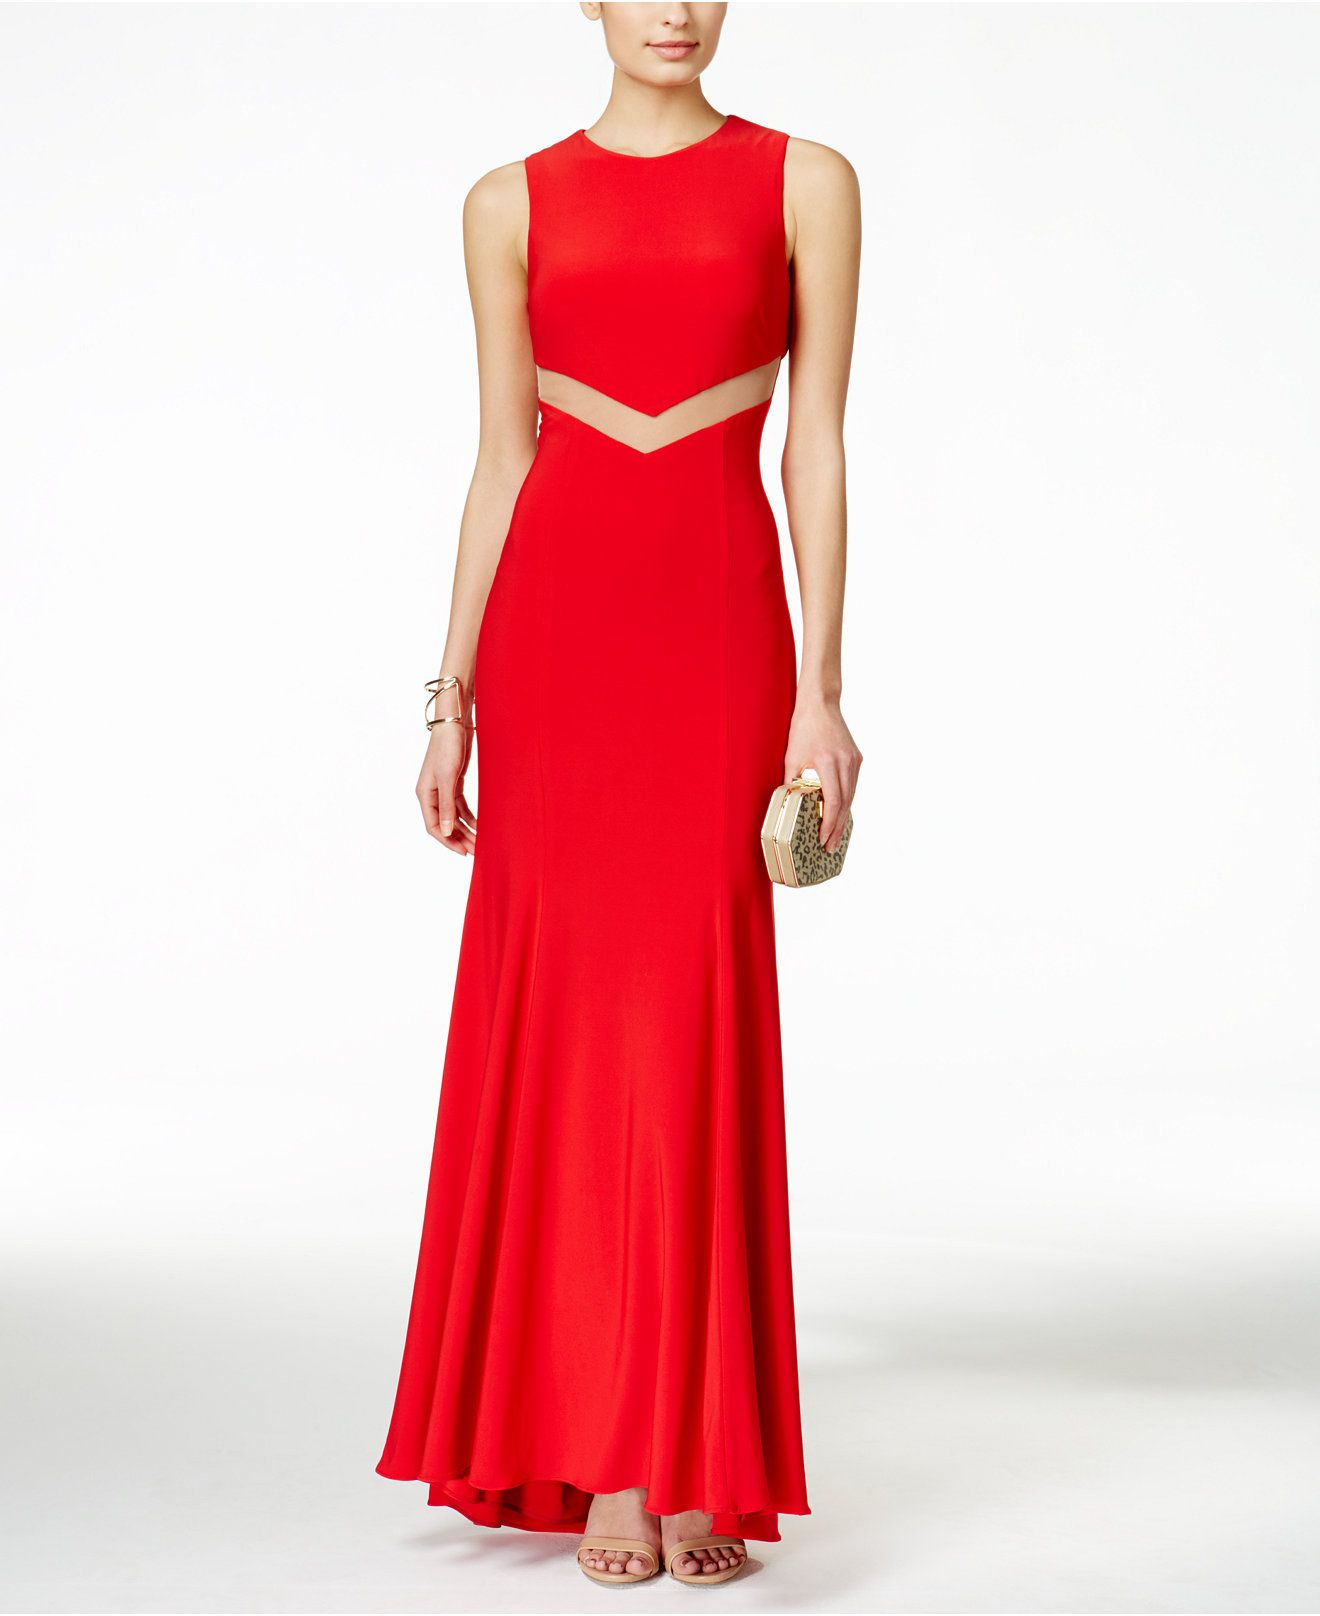 Betsy u adam mesh cutoutback sleeveless gown juniors shop all